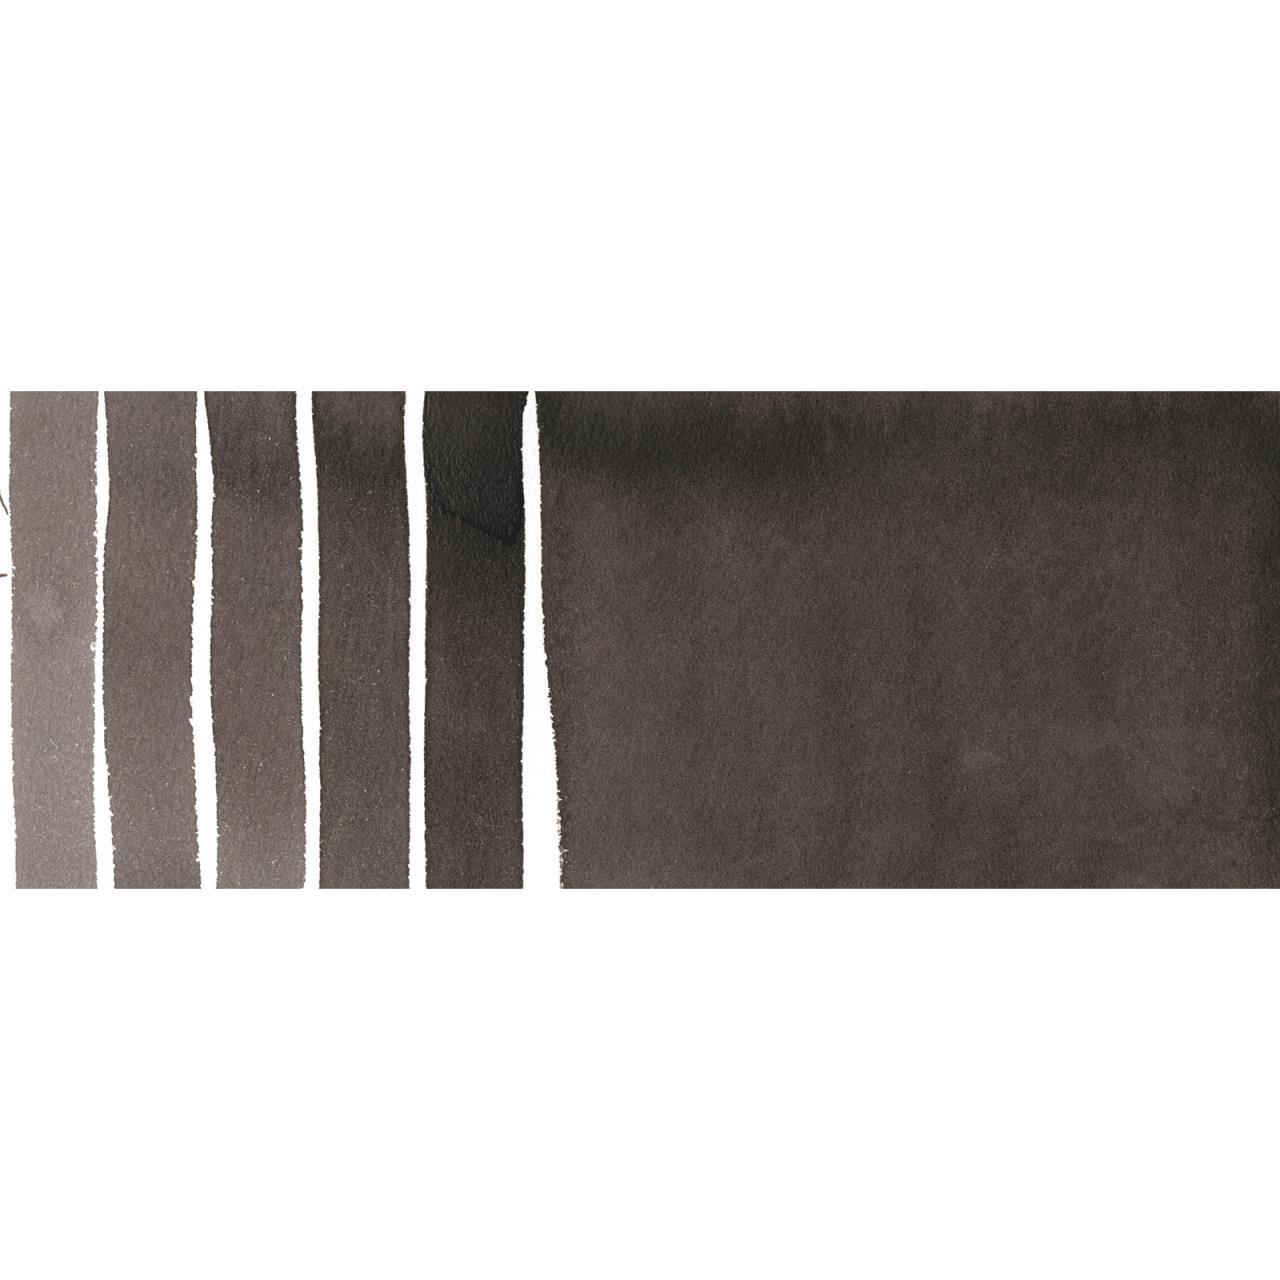 Neutral Tint, DANIEL SMITH Extra Fine Watercolors 5ml Tubes -